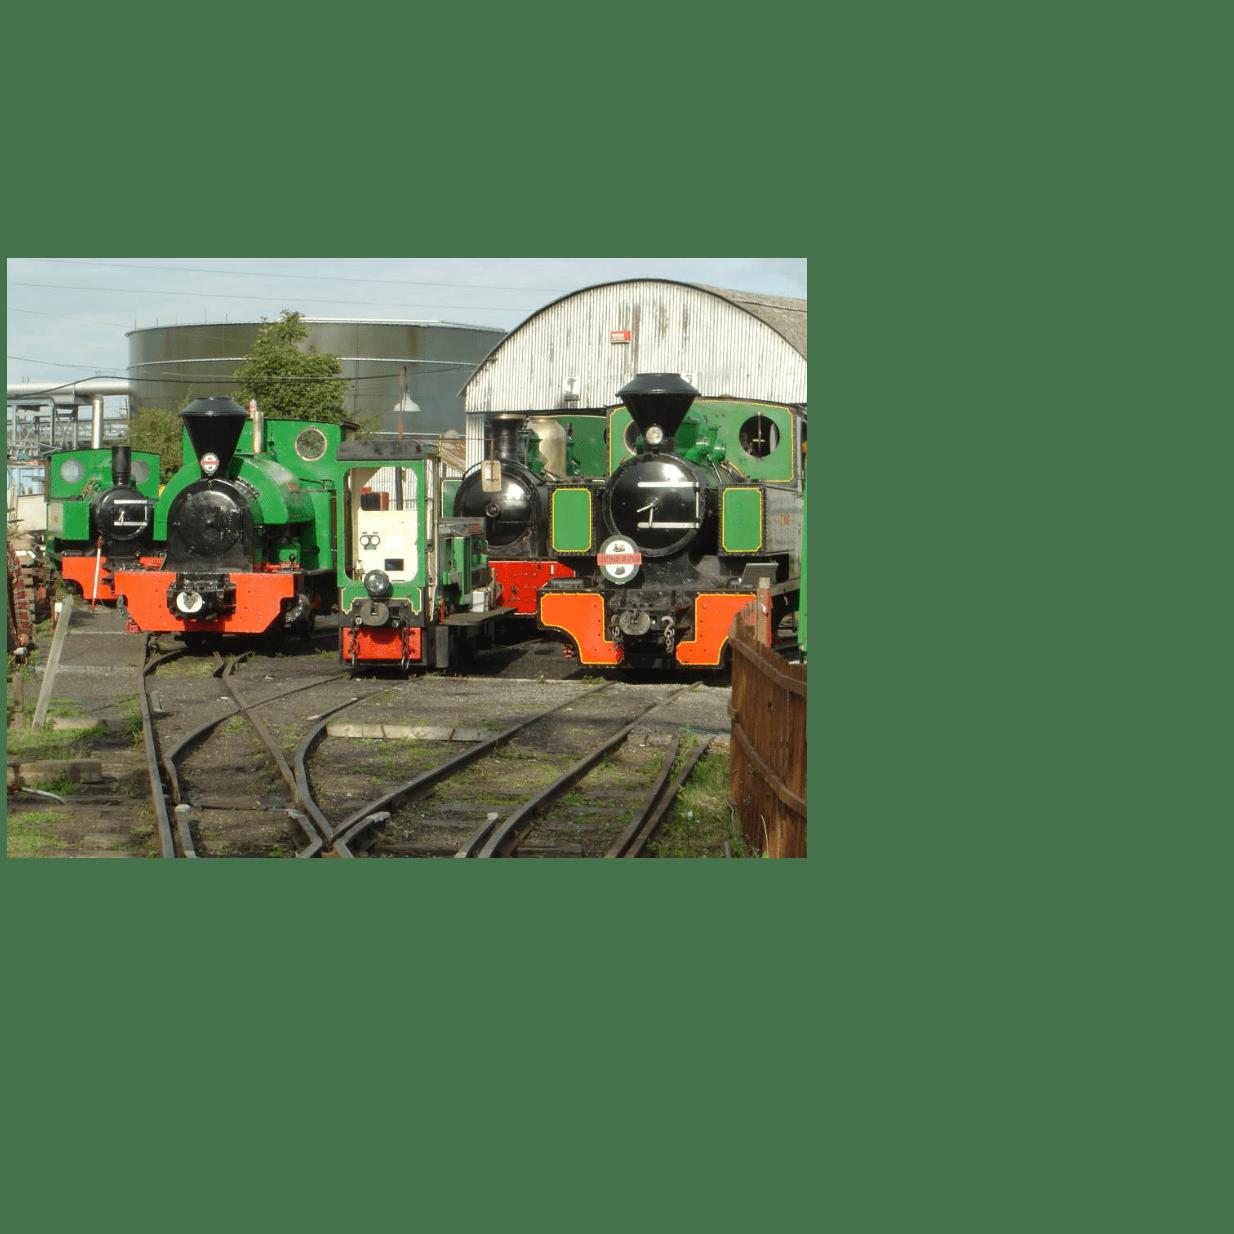 Dormant - Sittingbourne And Kemsley Light Railway